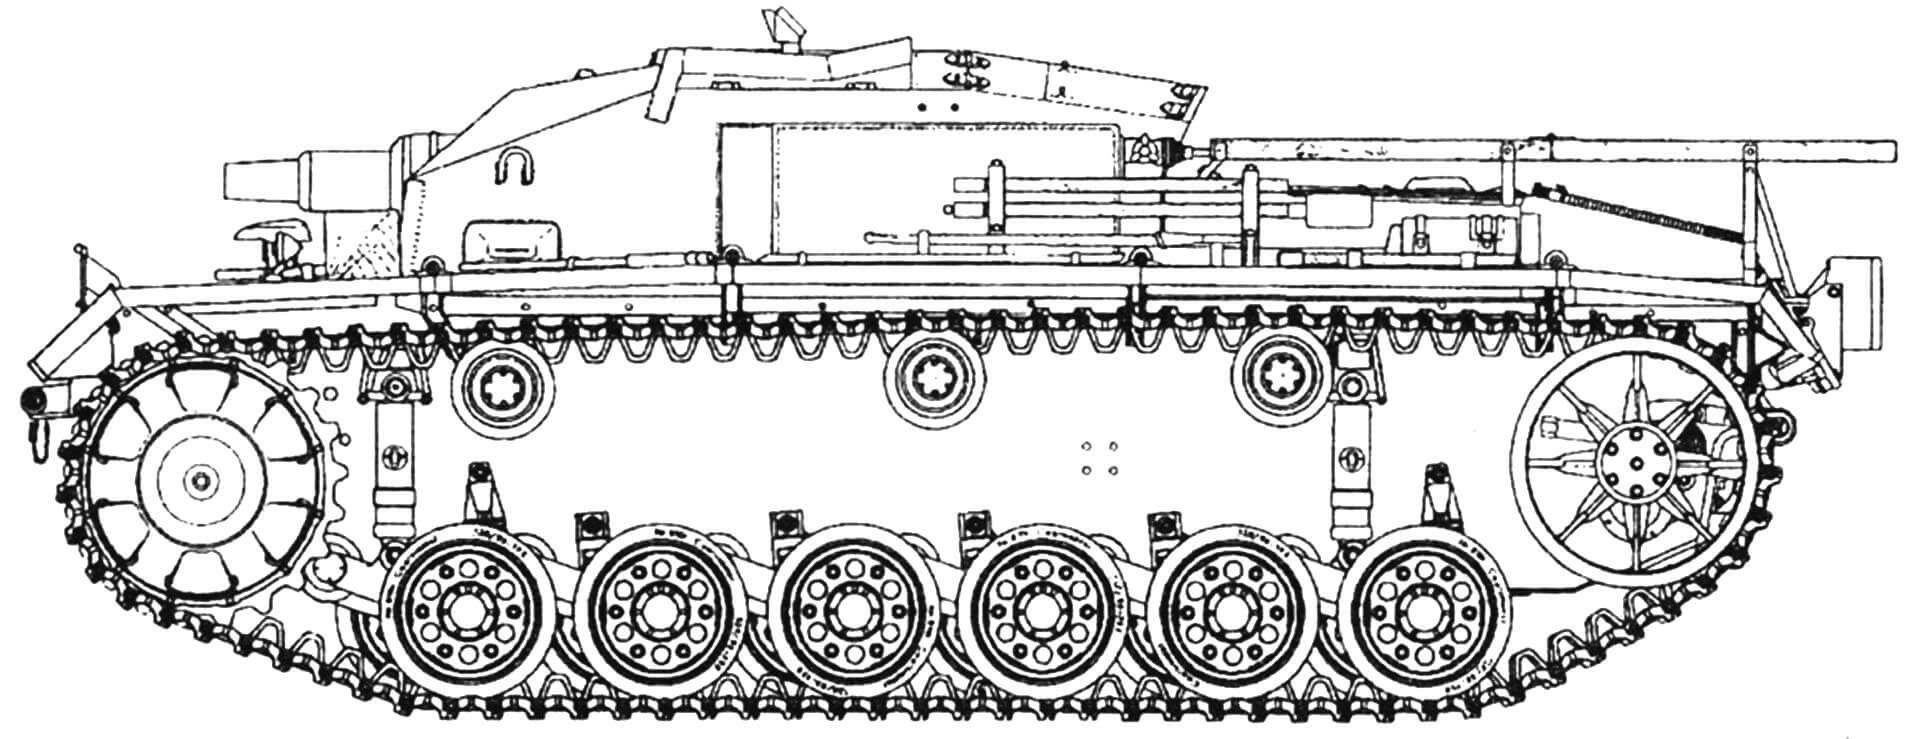 StuG III Ausf. В